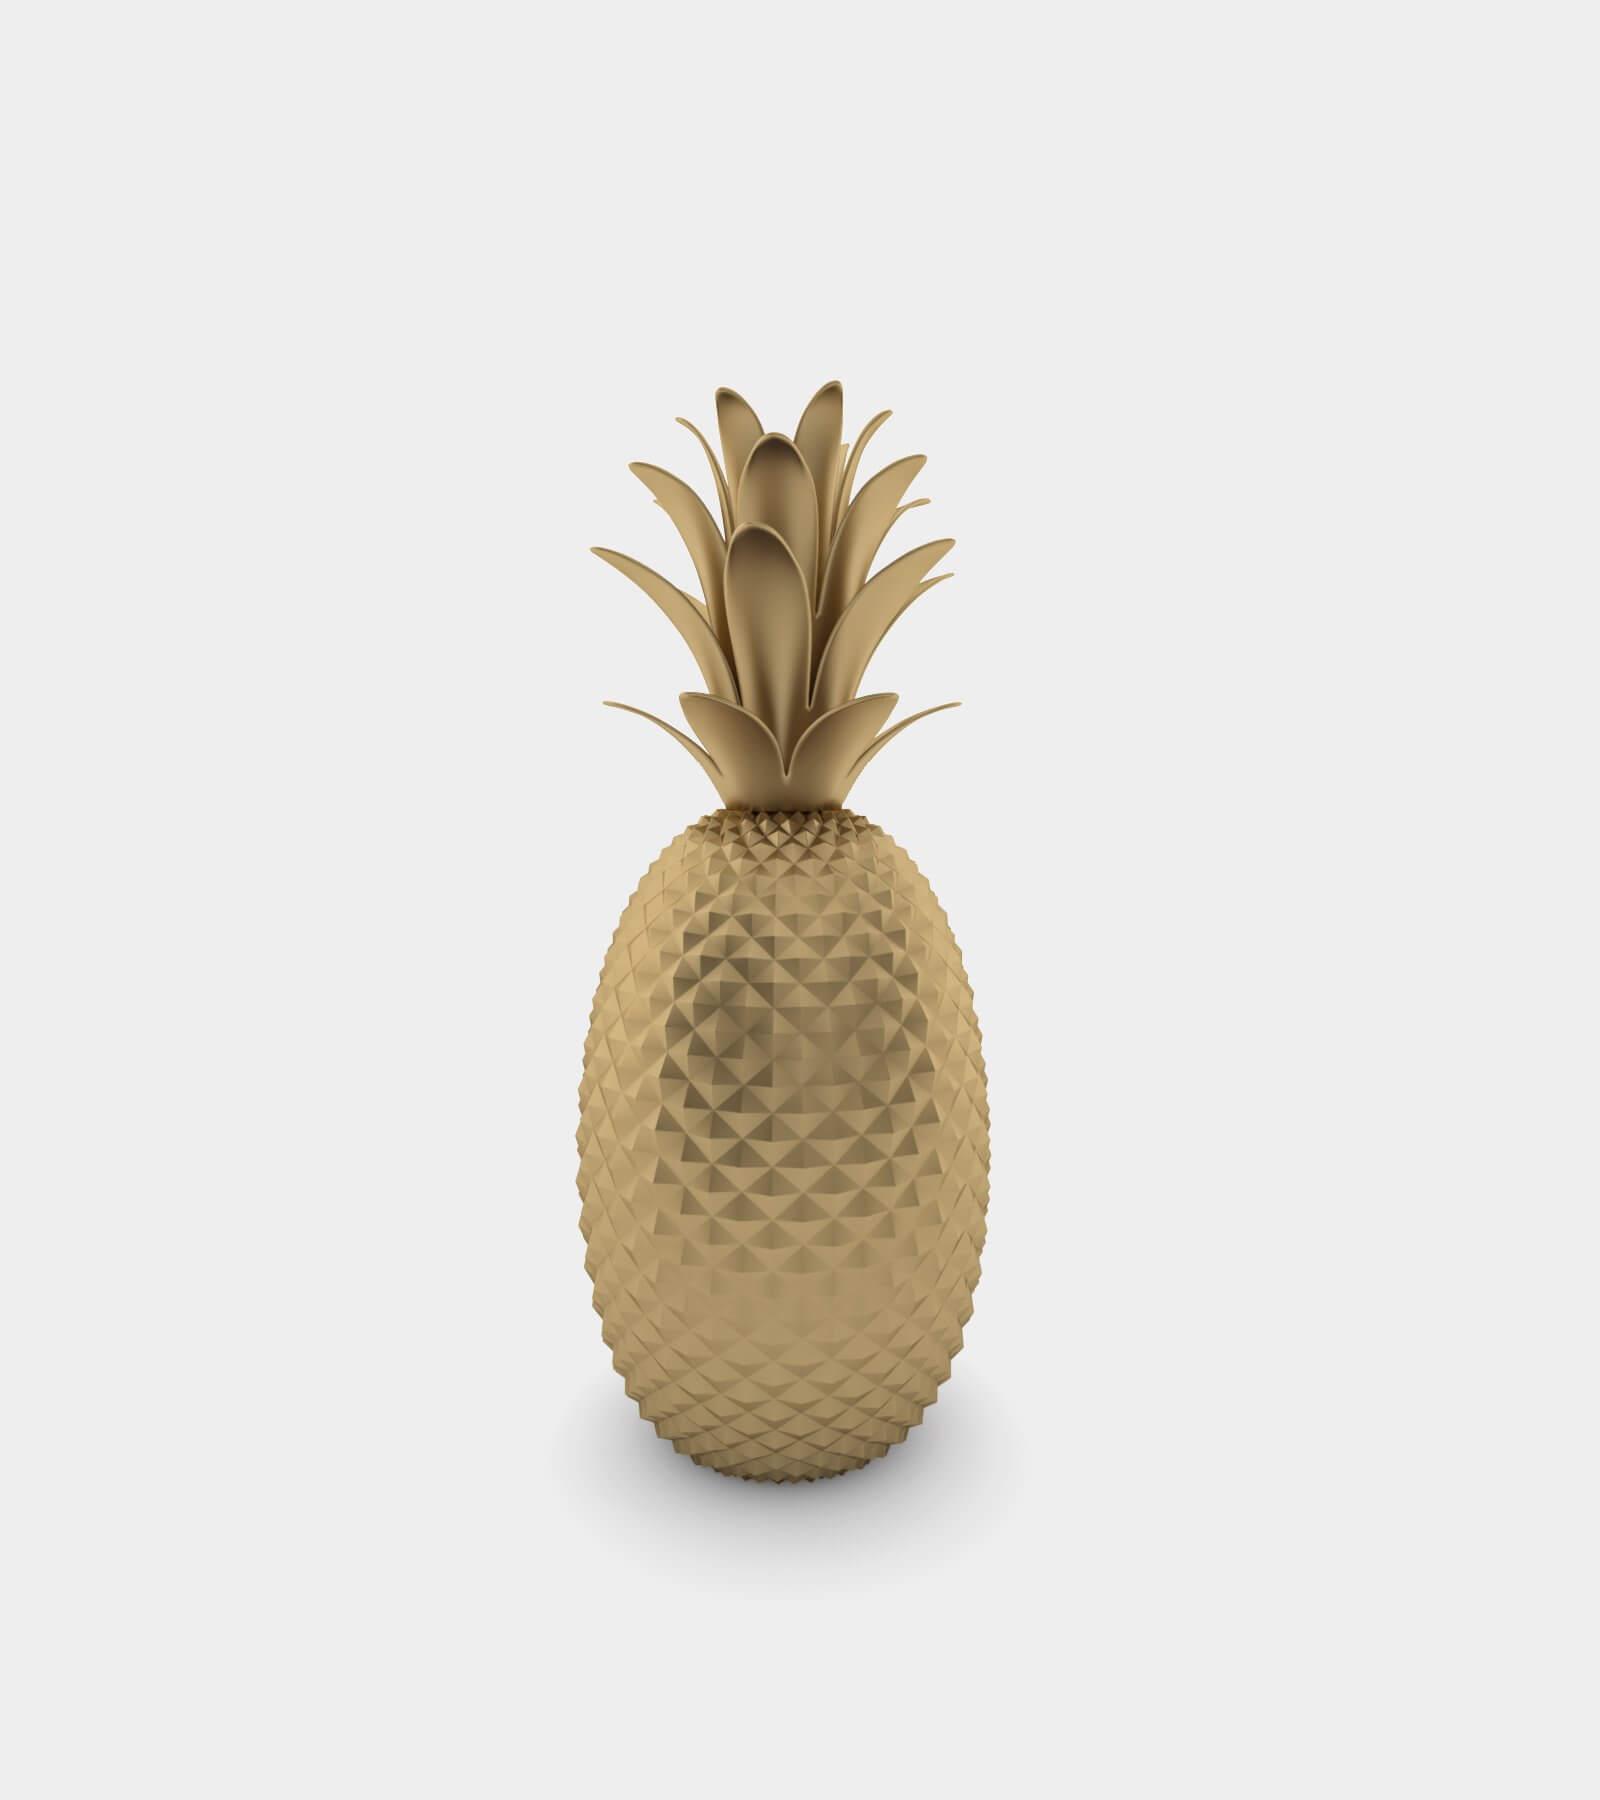 Pineapple statue 2 - 3D Model